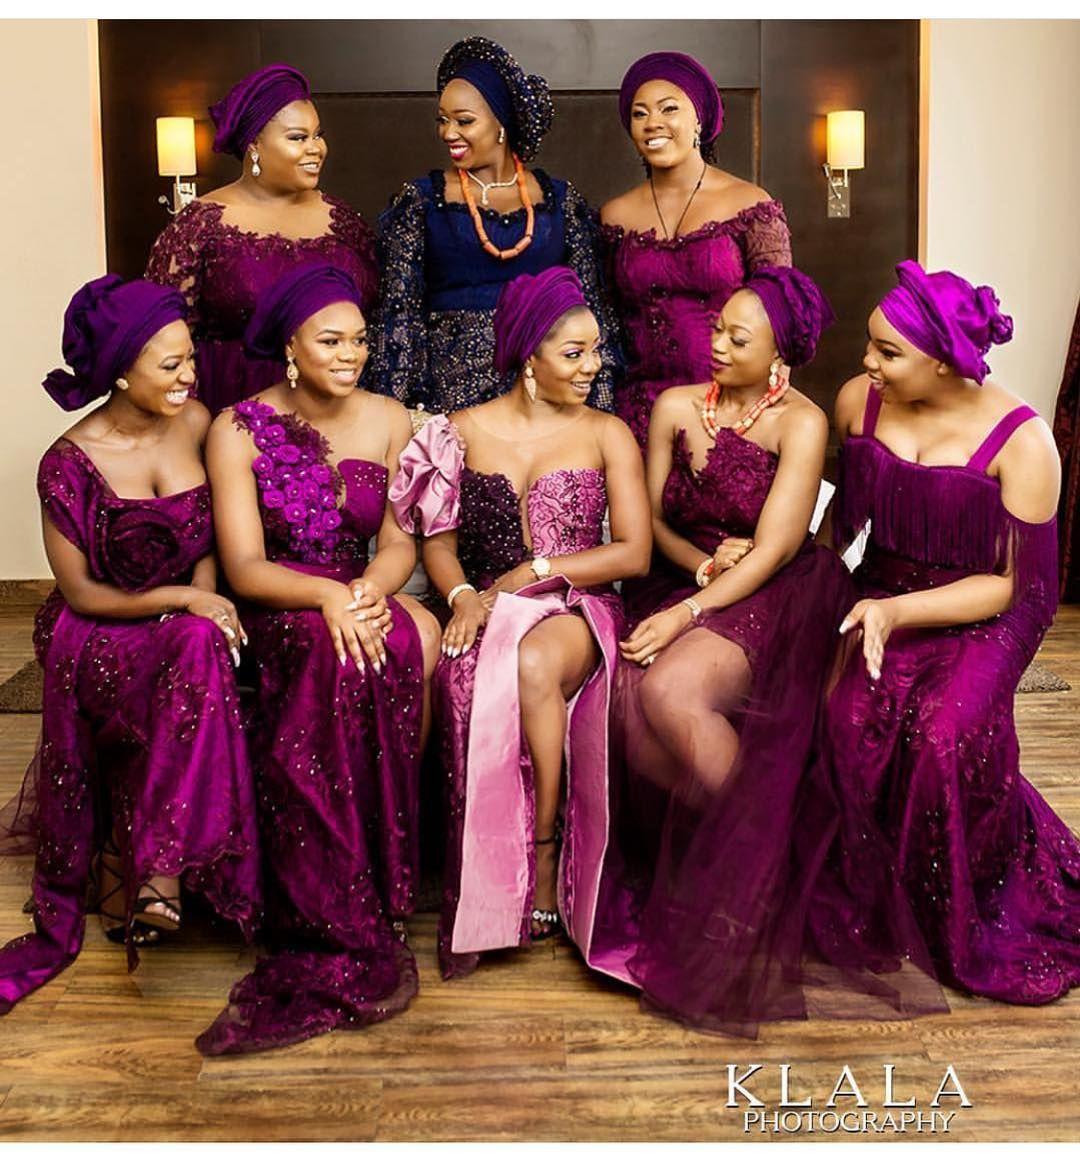 No 1 Nigerian Wedding Blog On Instagram Is Your Squad Lit Enough Wedding Planner Ban Nigerian Bridesmaid Nigerian Wedding Dress African Wedding Attire